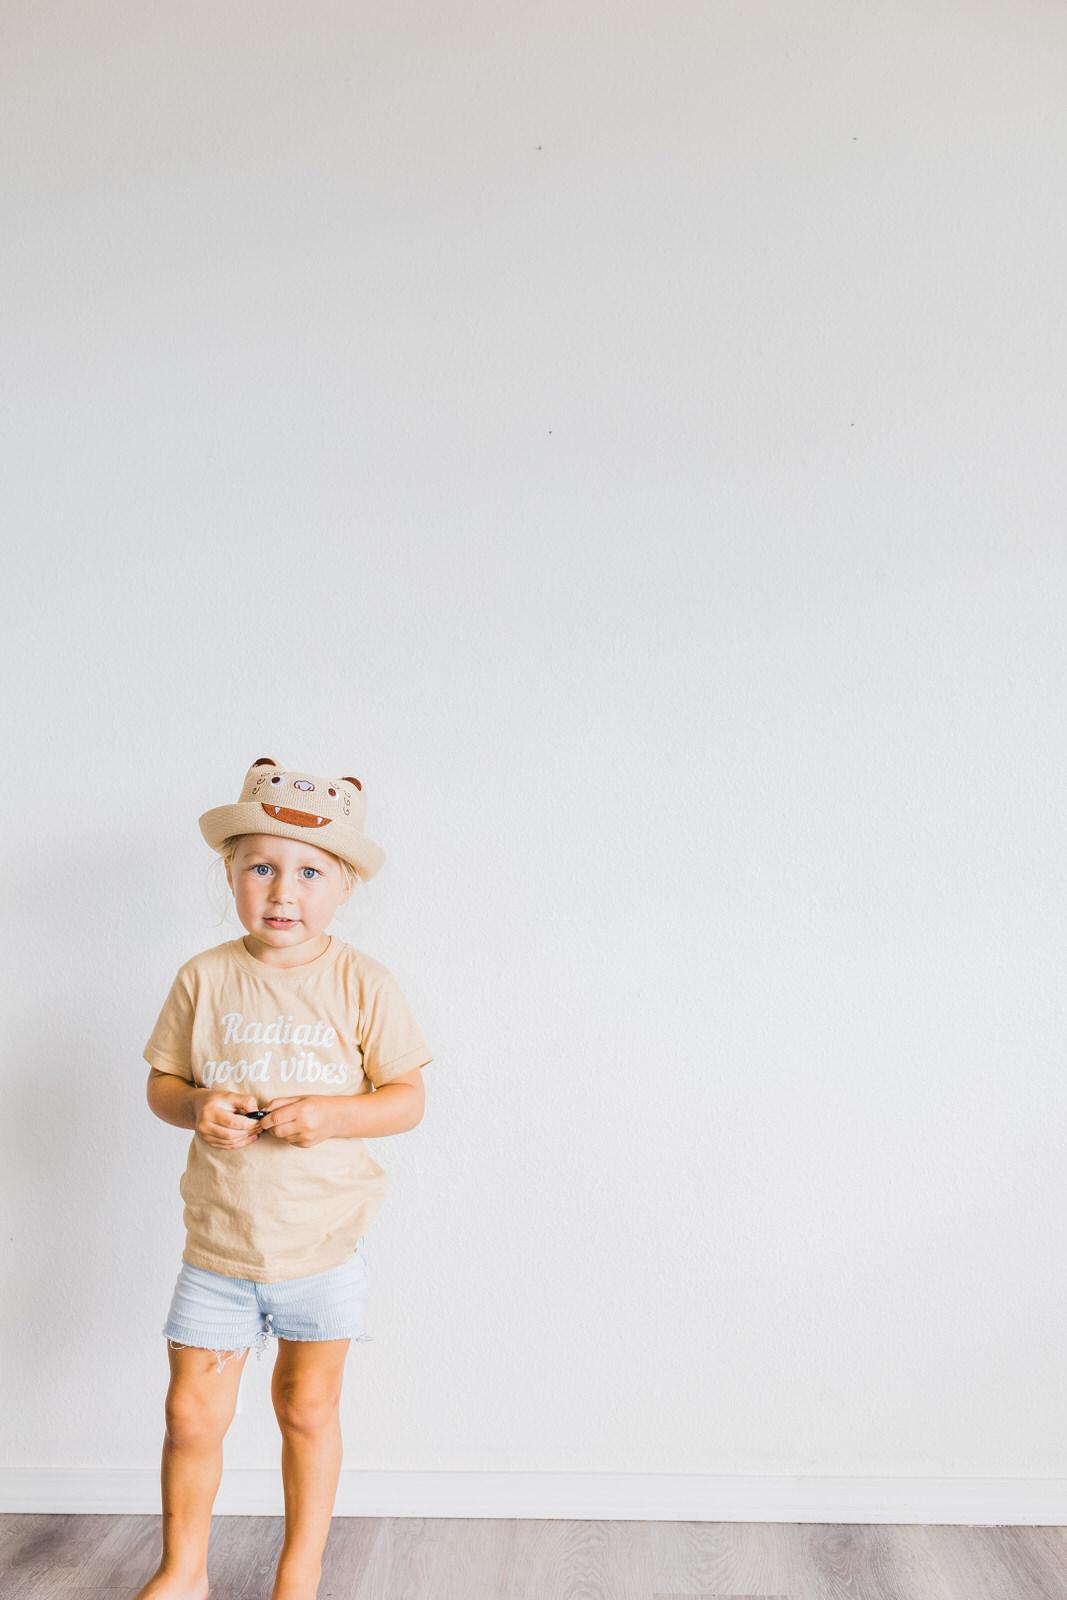 kids-clothes-small-business-collaboration-women-hawaii-7817.jpg